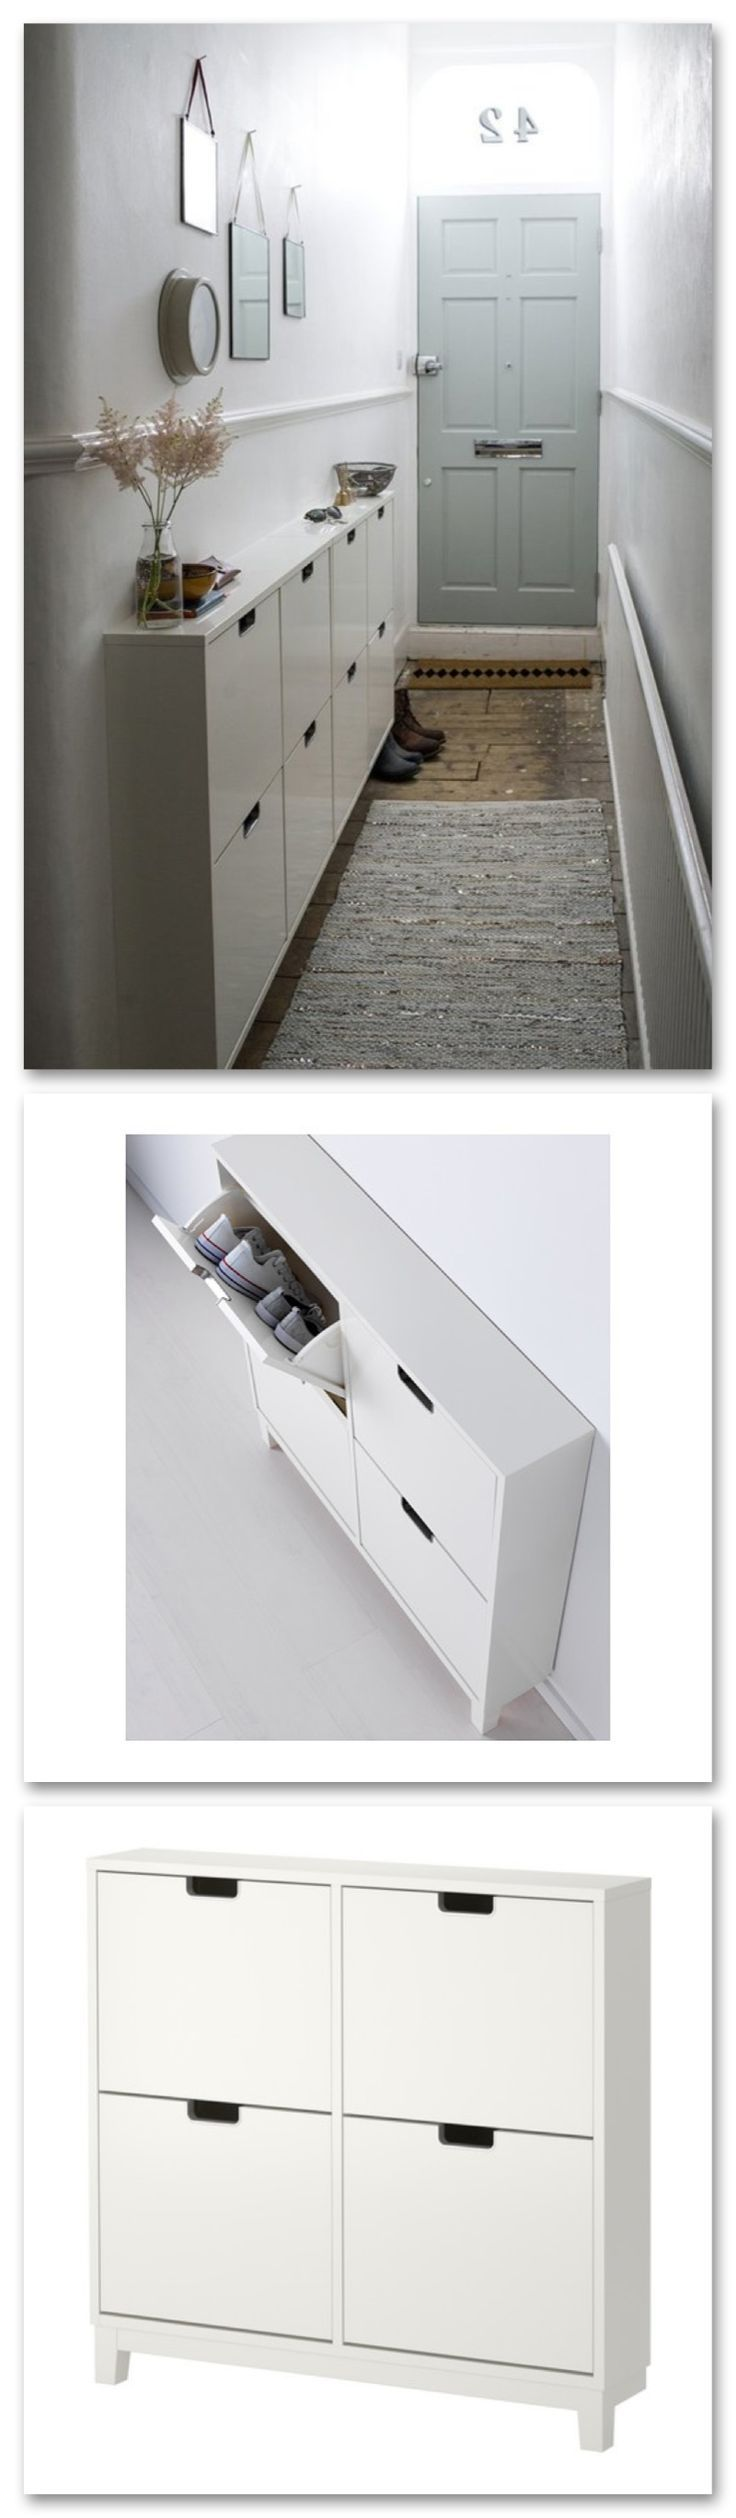 Small hallway furniture  Puerta de entrada  Buenas Ideas  Pinterest  Hall Storage and House